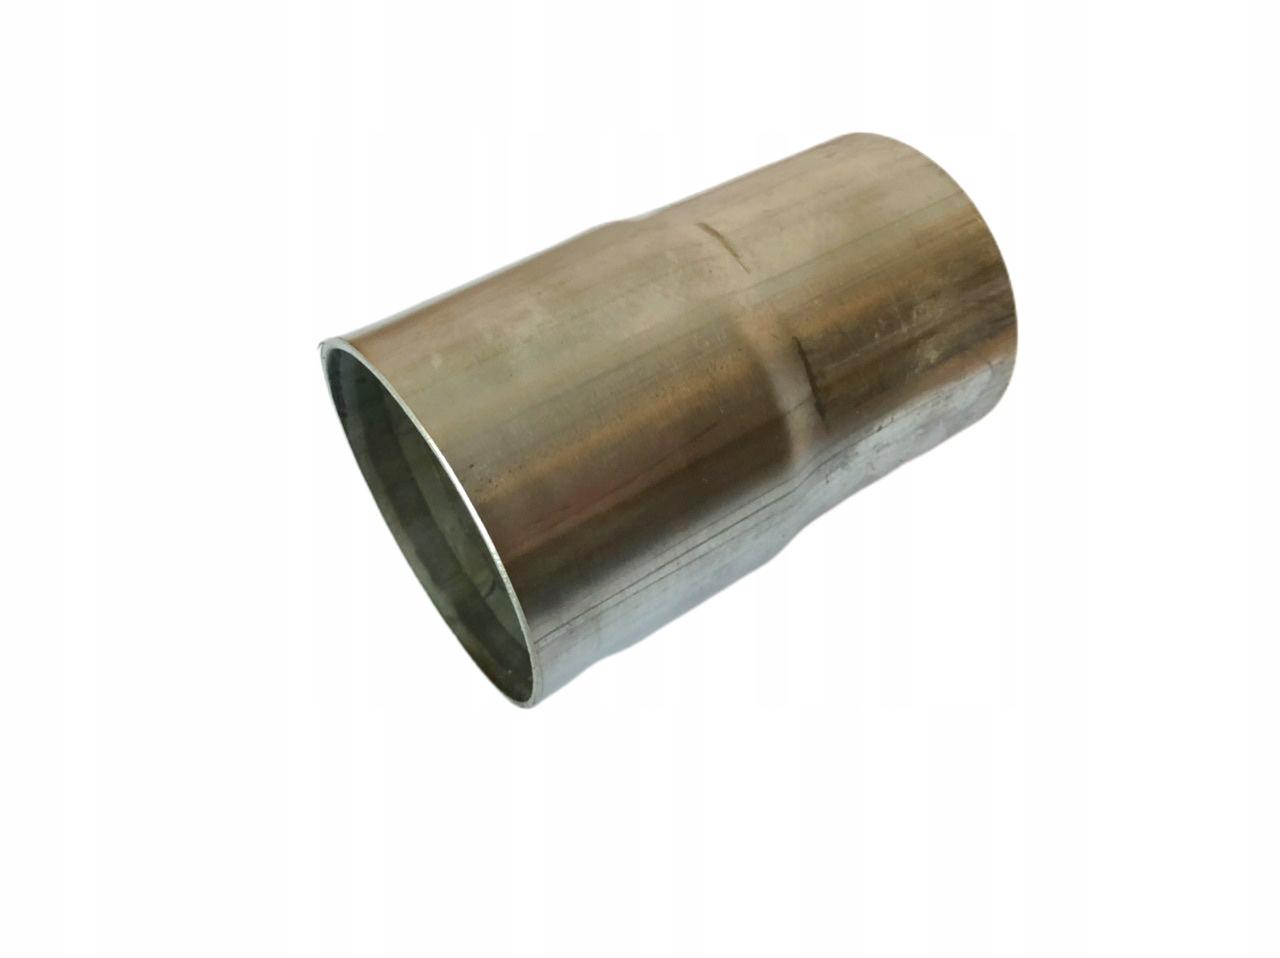 уменьшение заколка roztłoczenie сталь 545760